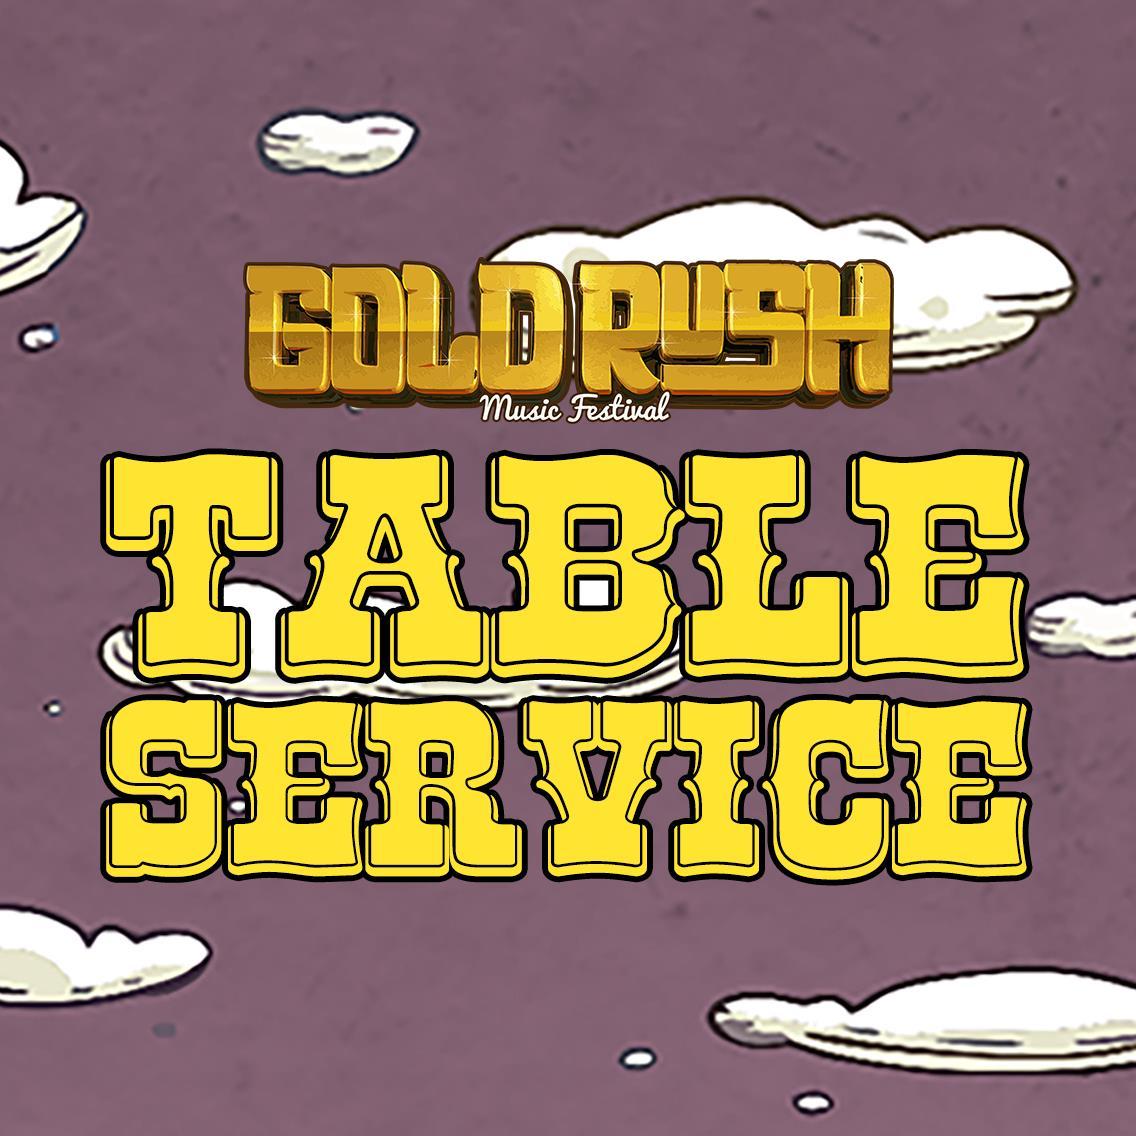 Goldrush - TABLES Tickets 09/29/18